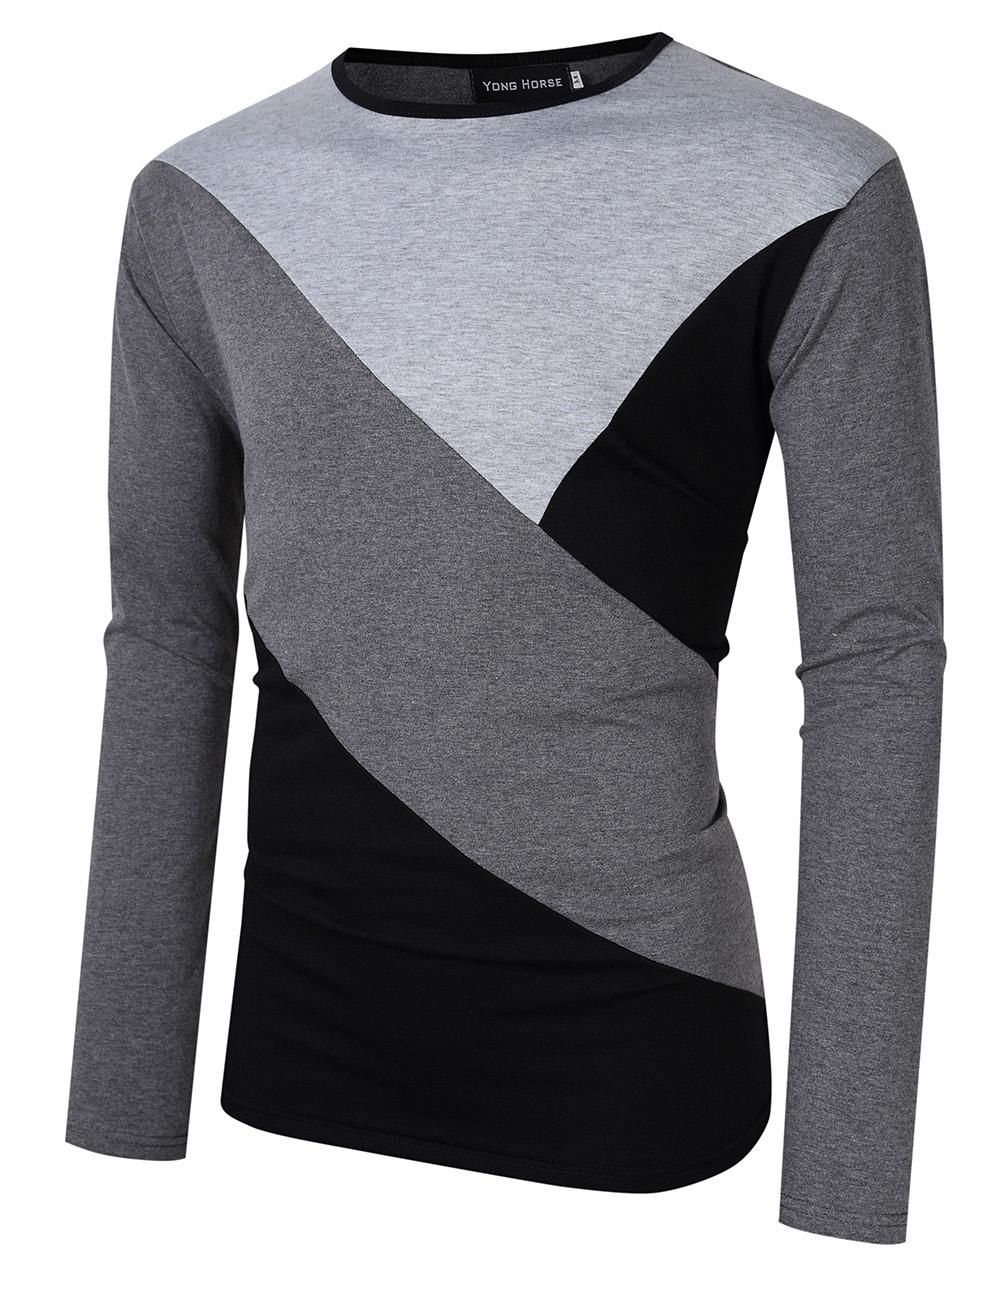 [US Direct] Yong Horse Men's Contrast Color Crewneck Long Sleeve Basic T Shirt Top Light gray + gray_XXL